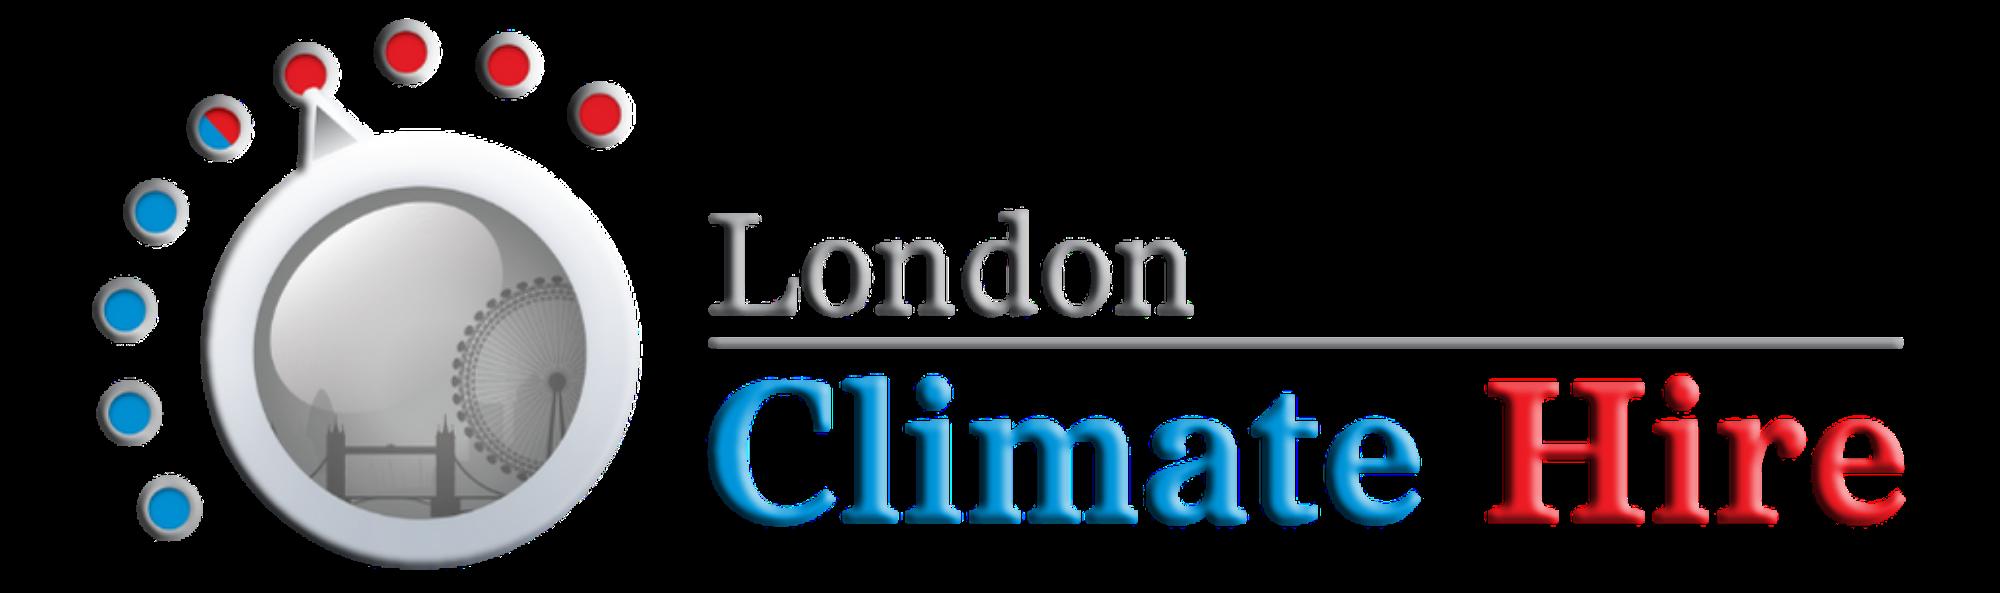 London Climate Hire Logo